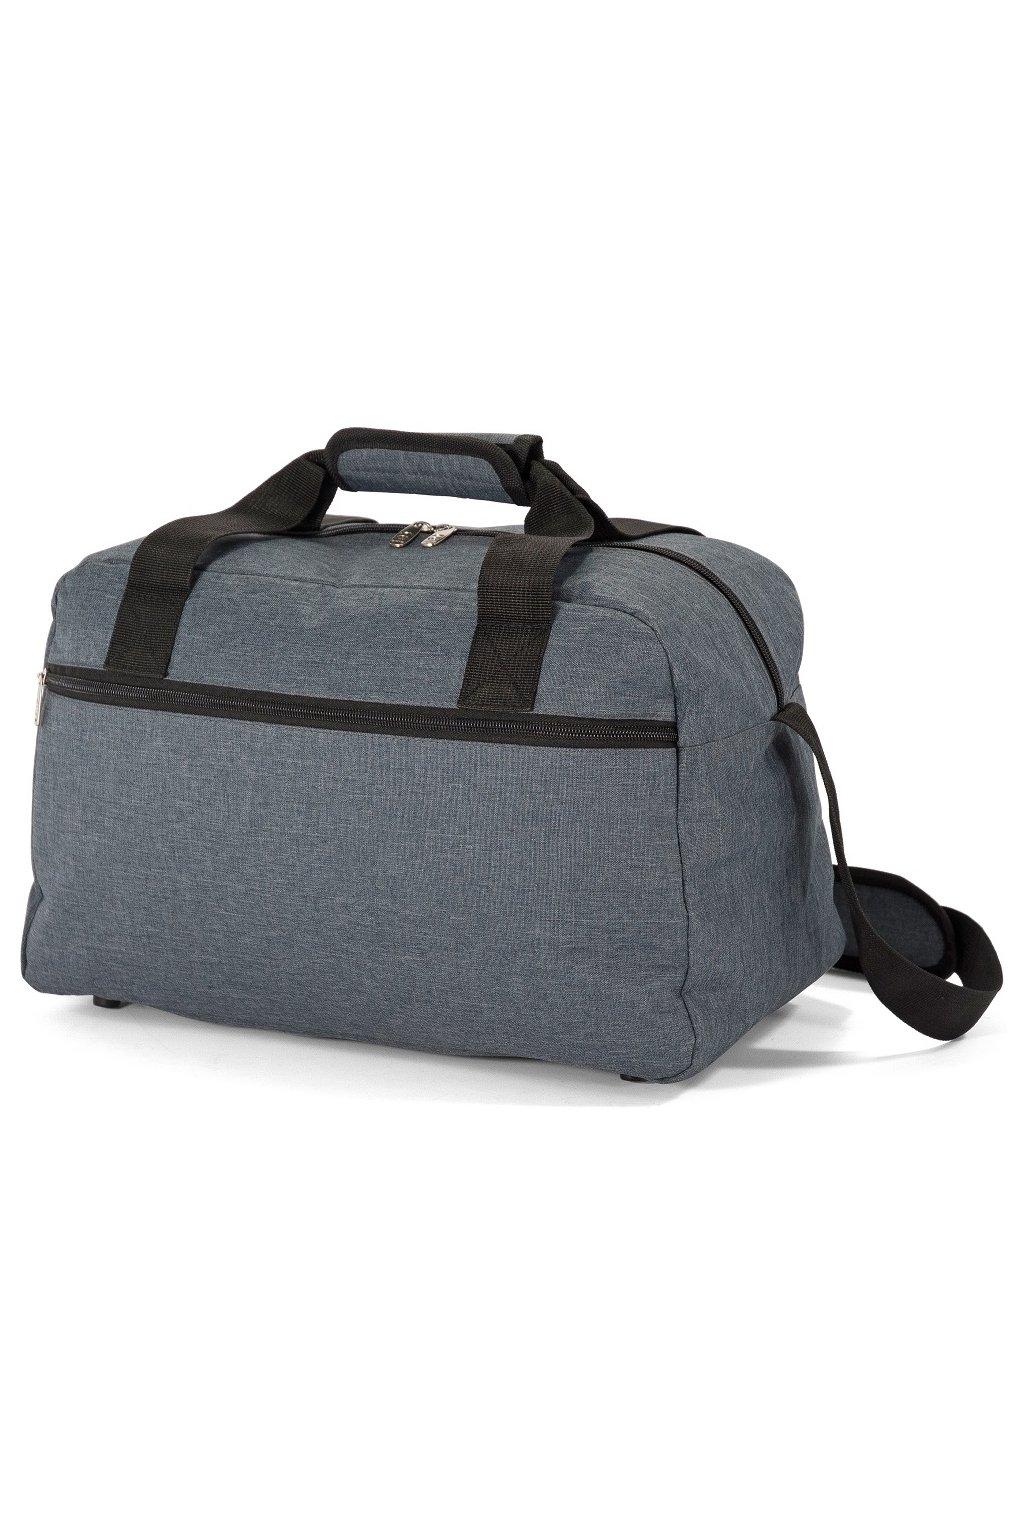 kufrland benzi 5528 grey